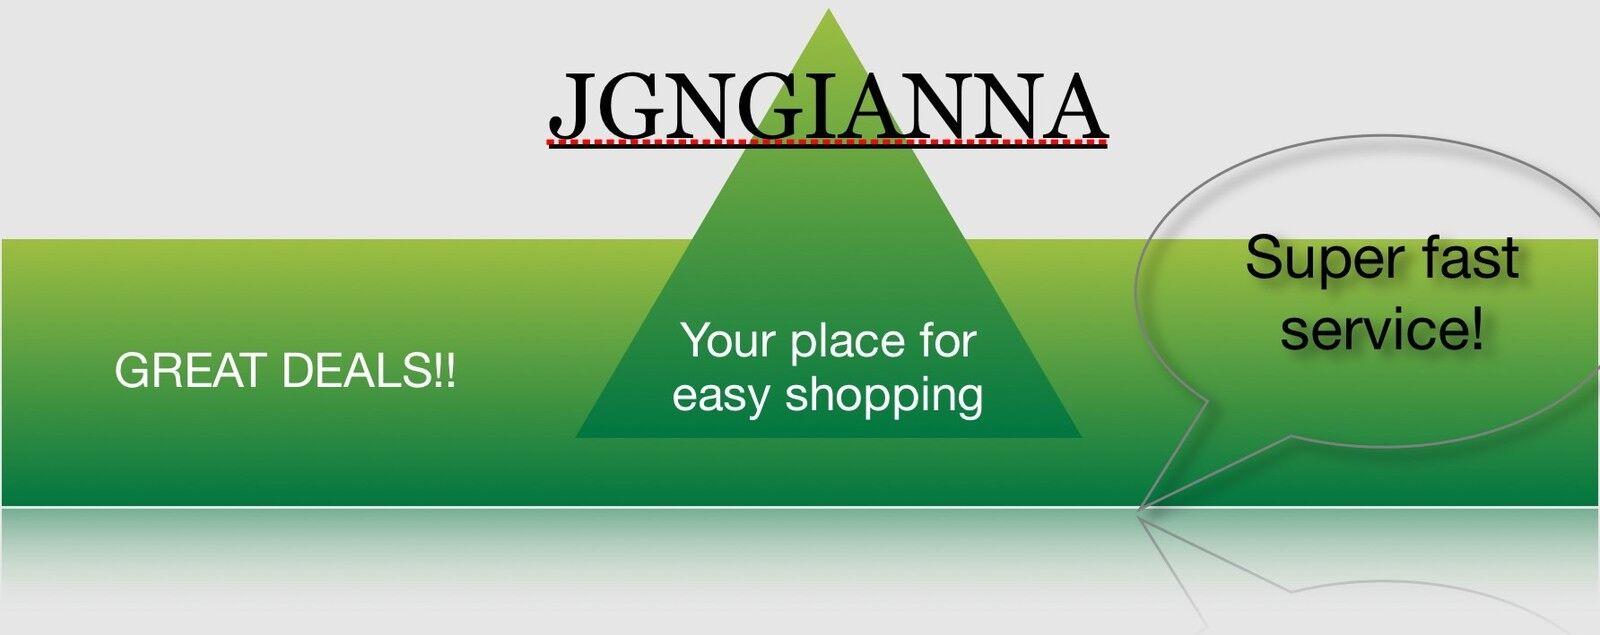 jgngianna